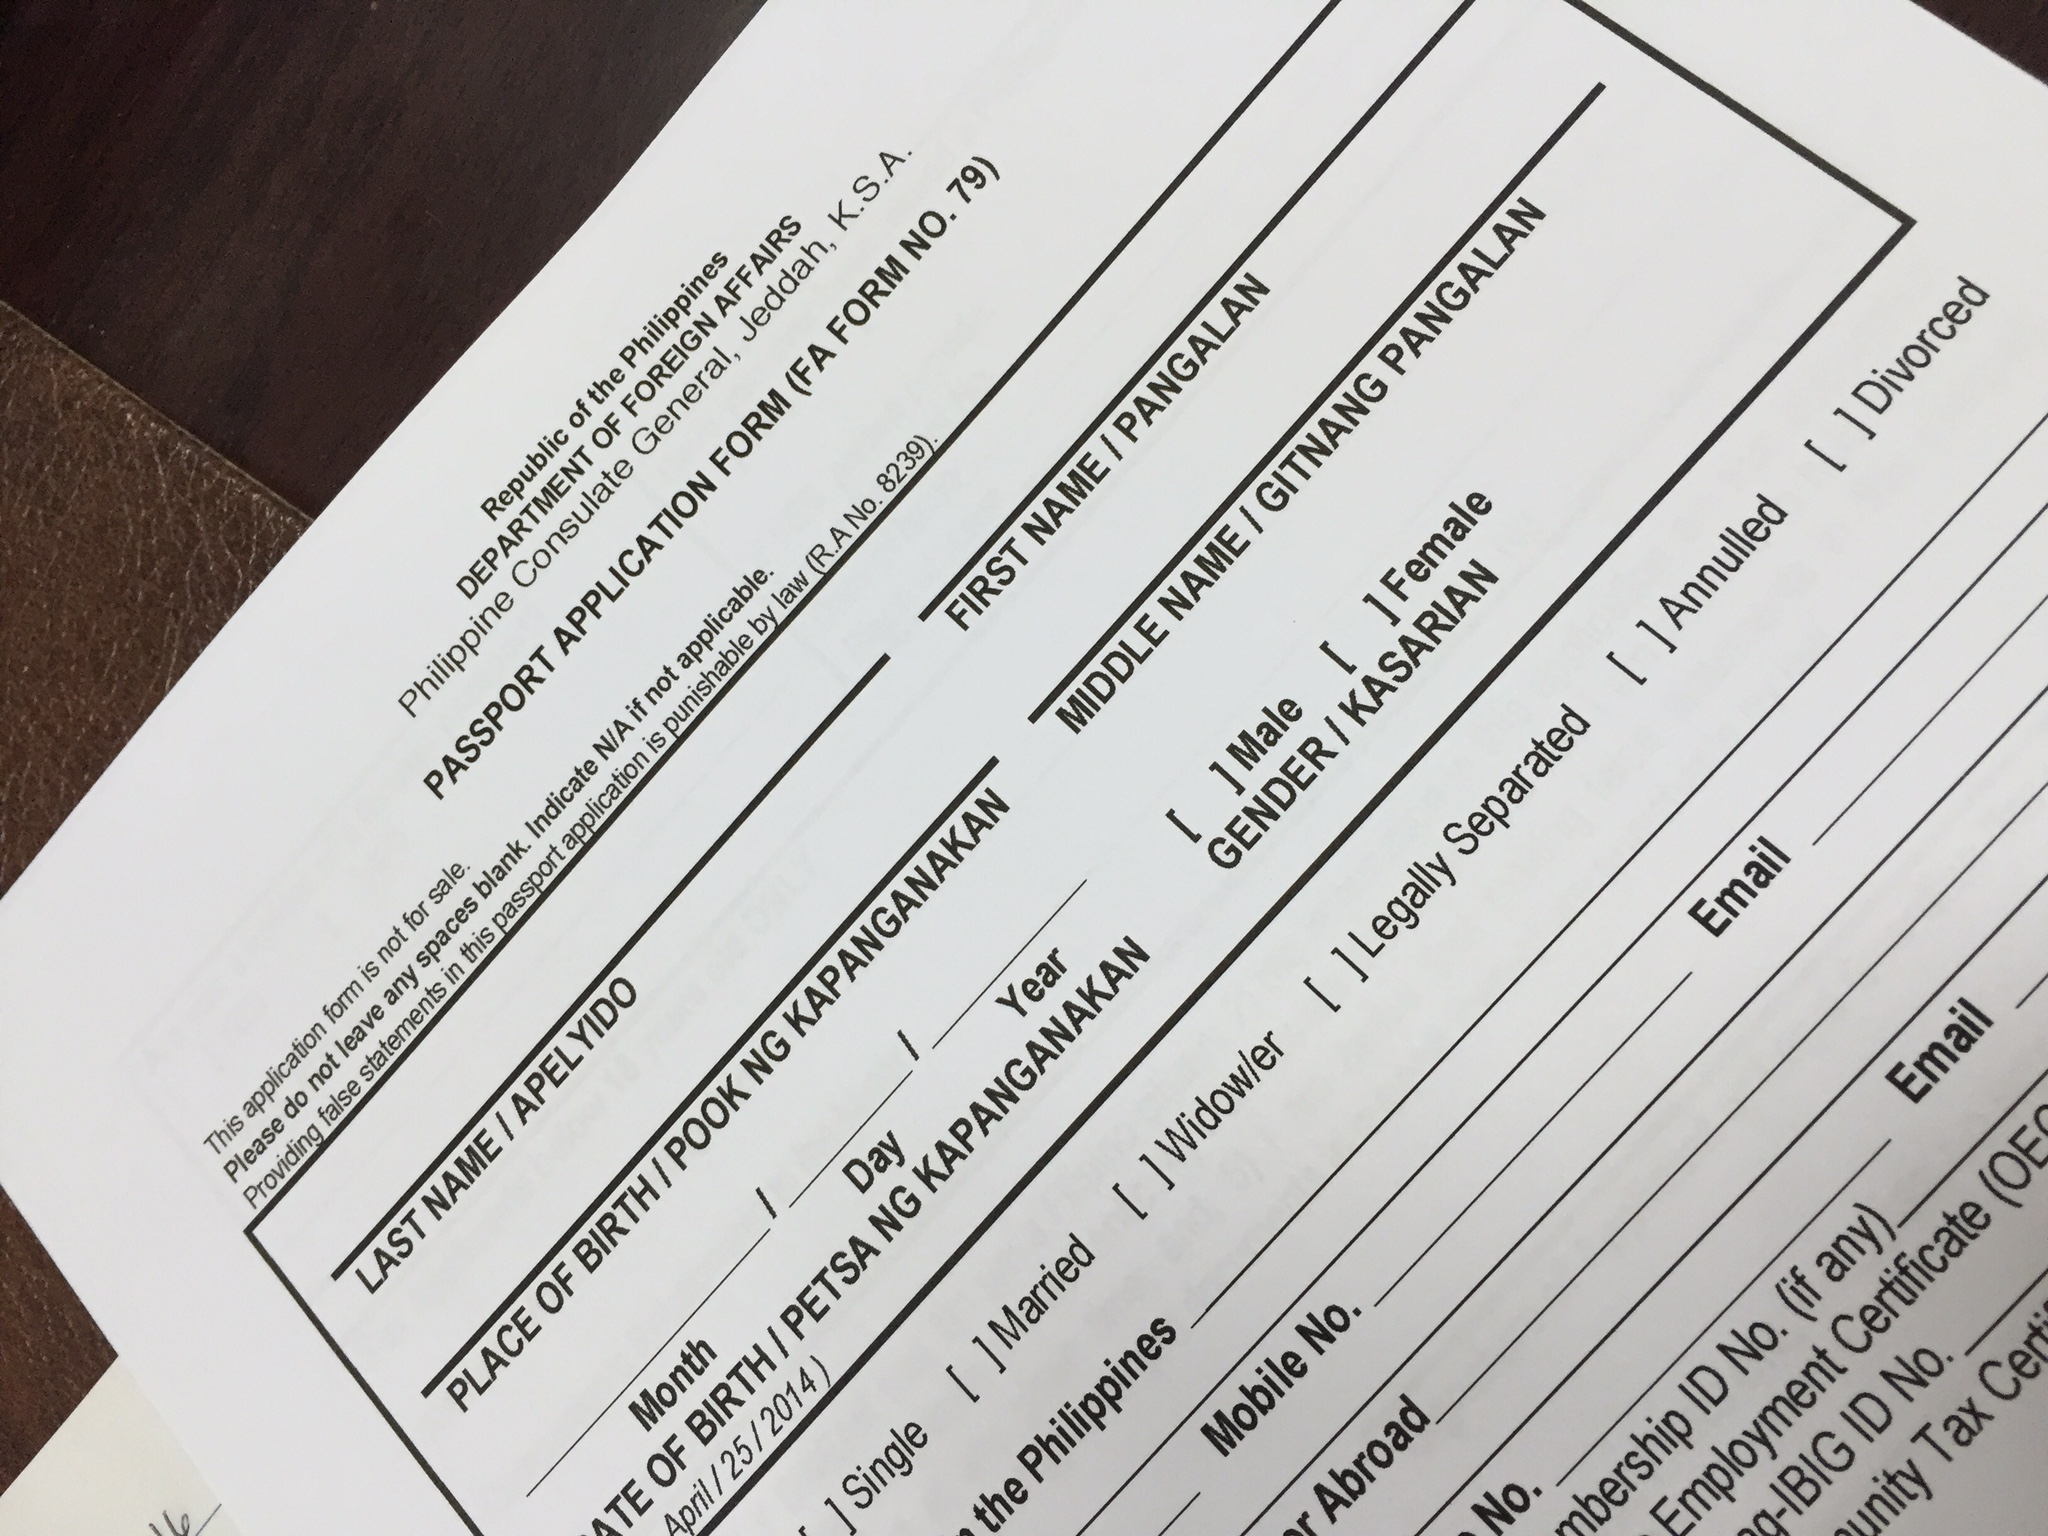 professional resume examples 2013 teacher resume cover letter brief description of resume